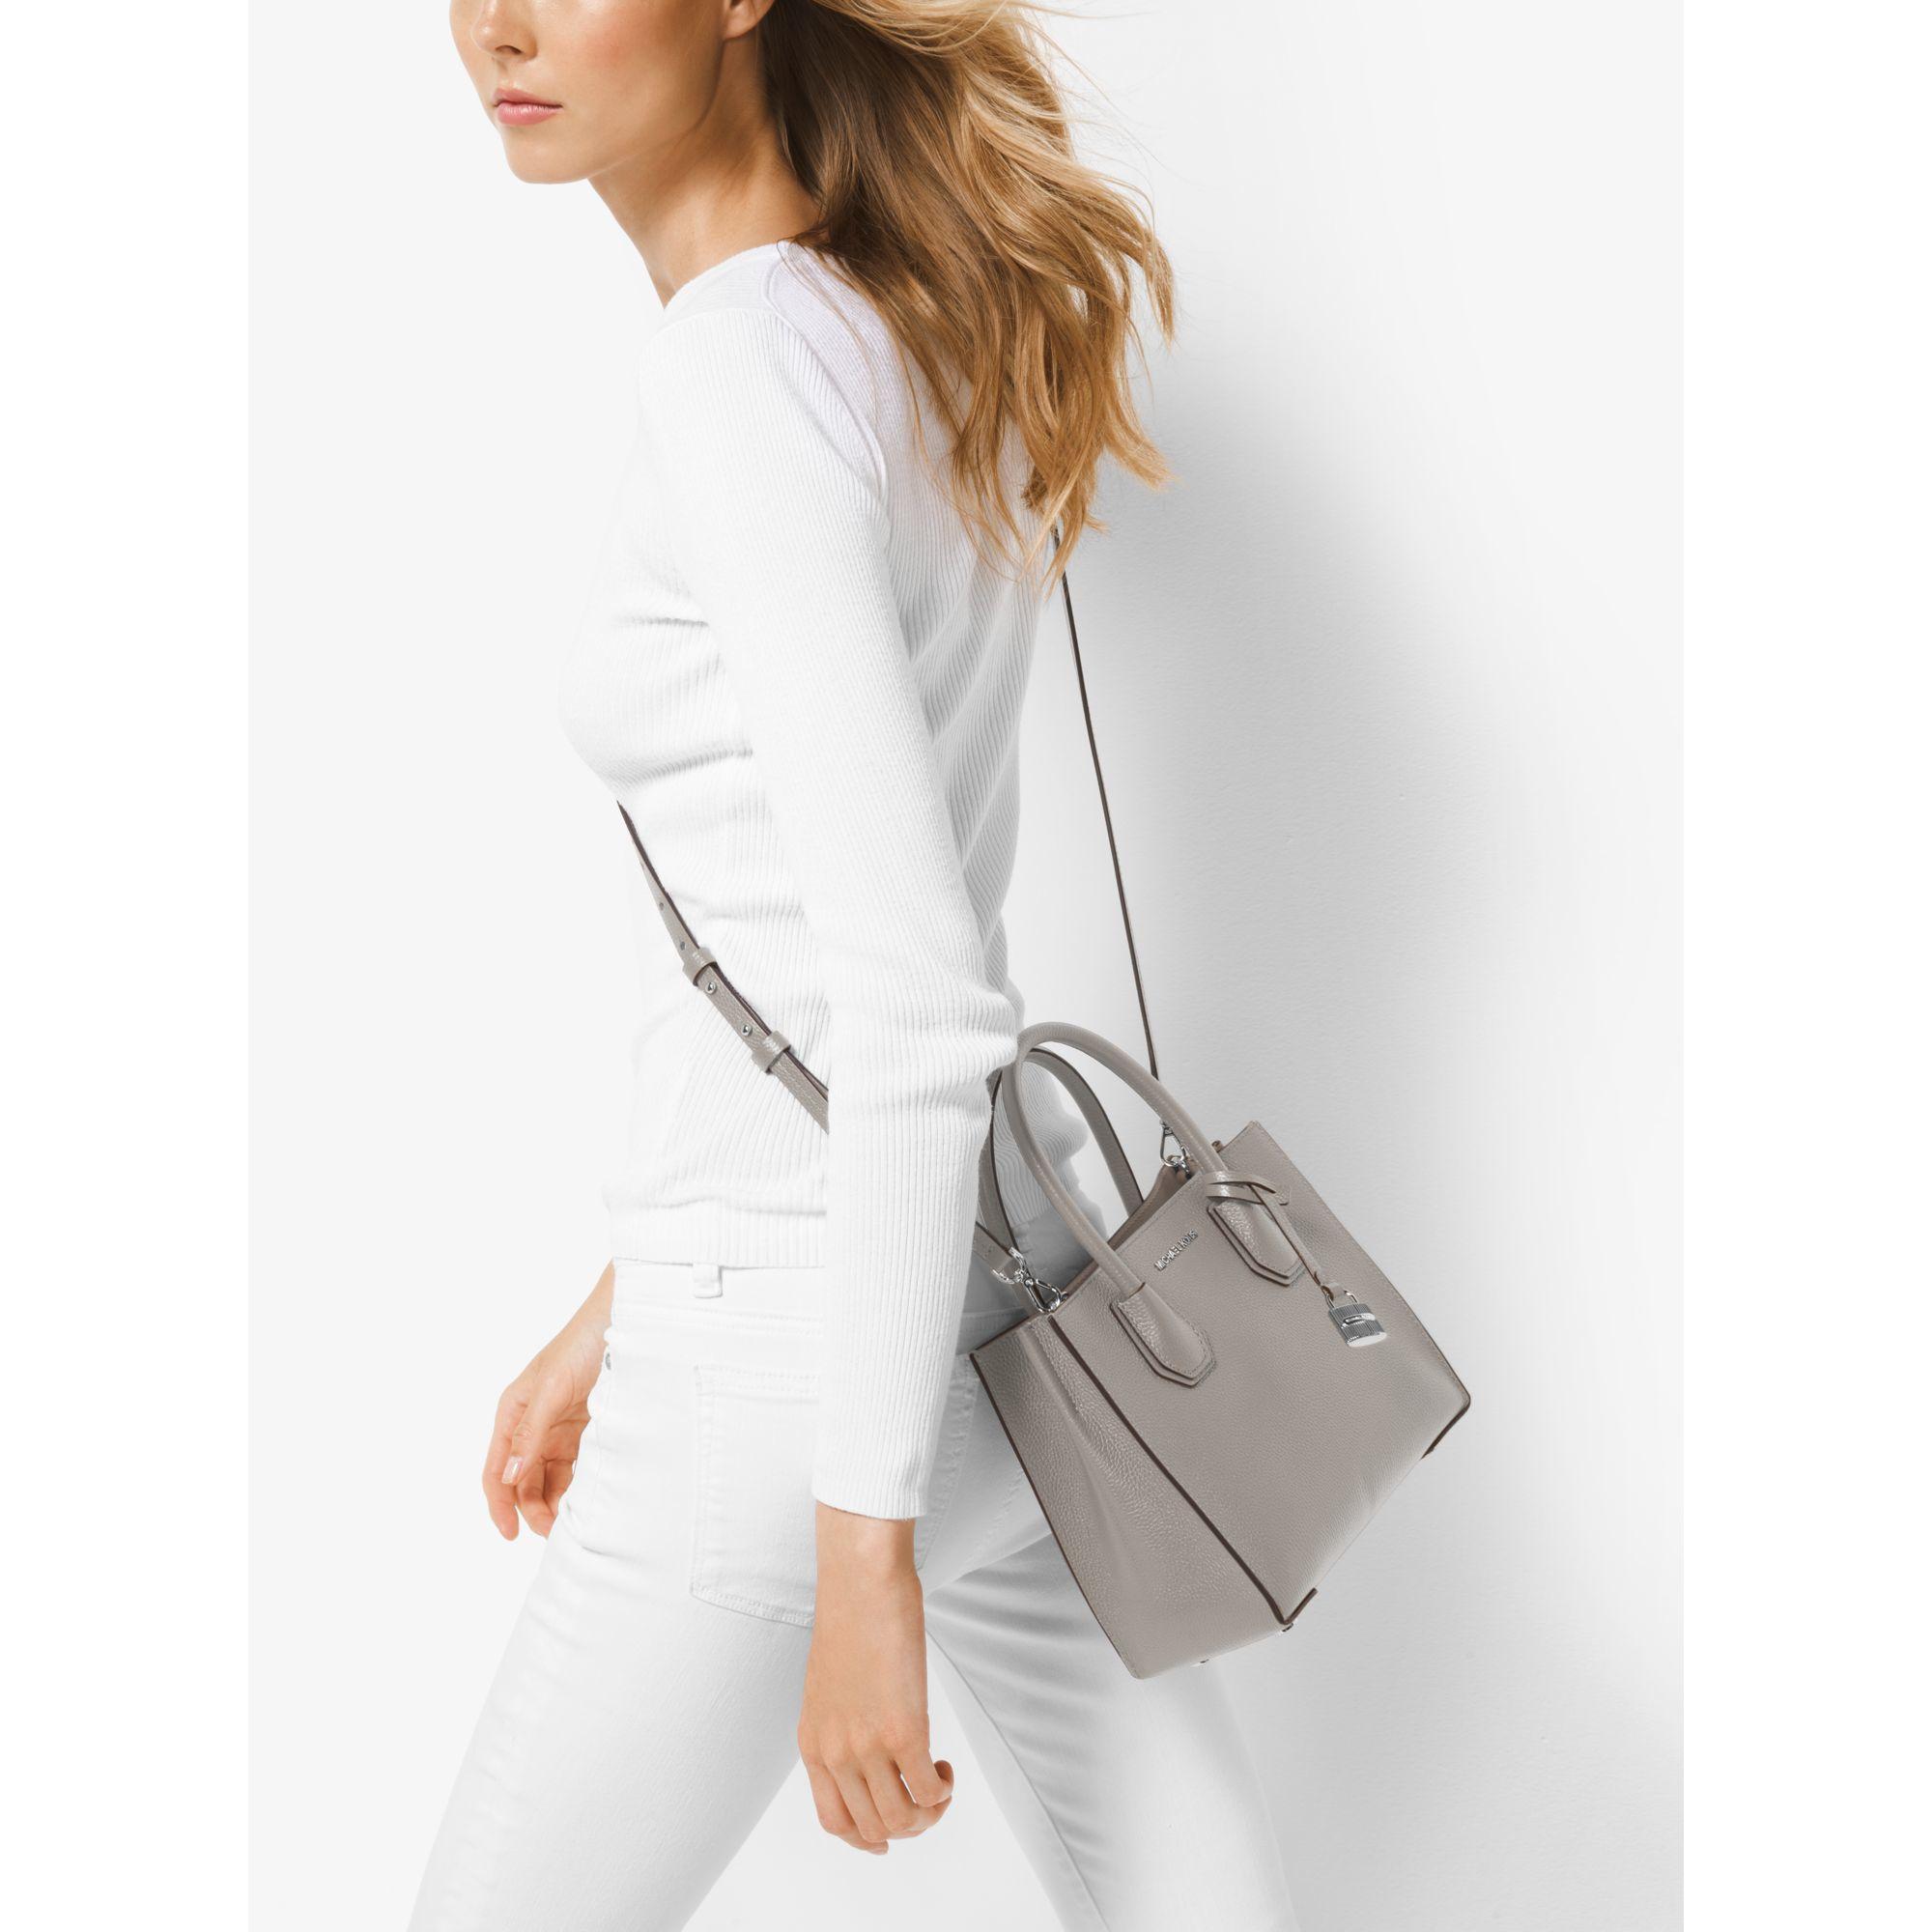 michael kors mercer medium leather cross body bag in gray. Black Bedroom Furniture Sets. Home Design Ideas